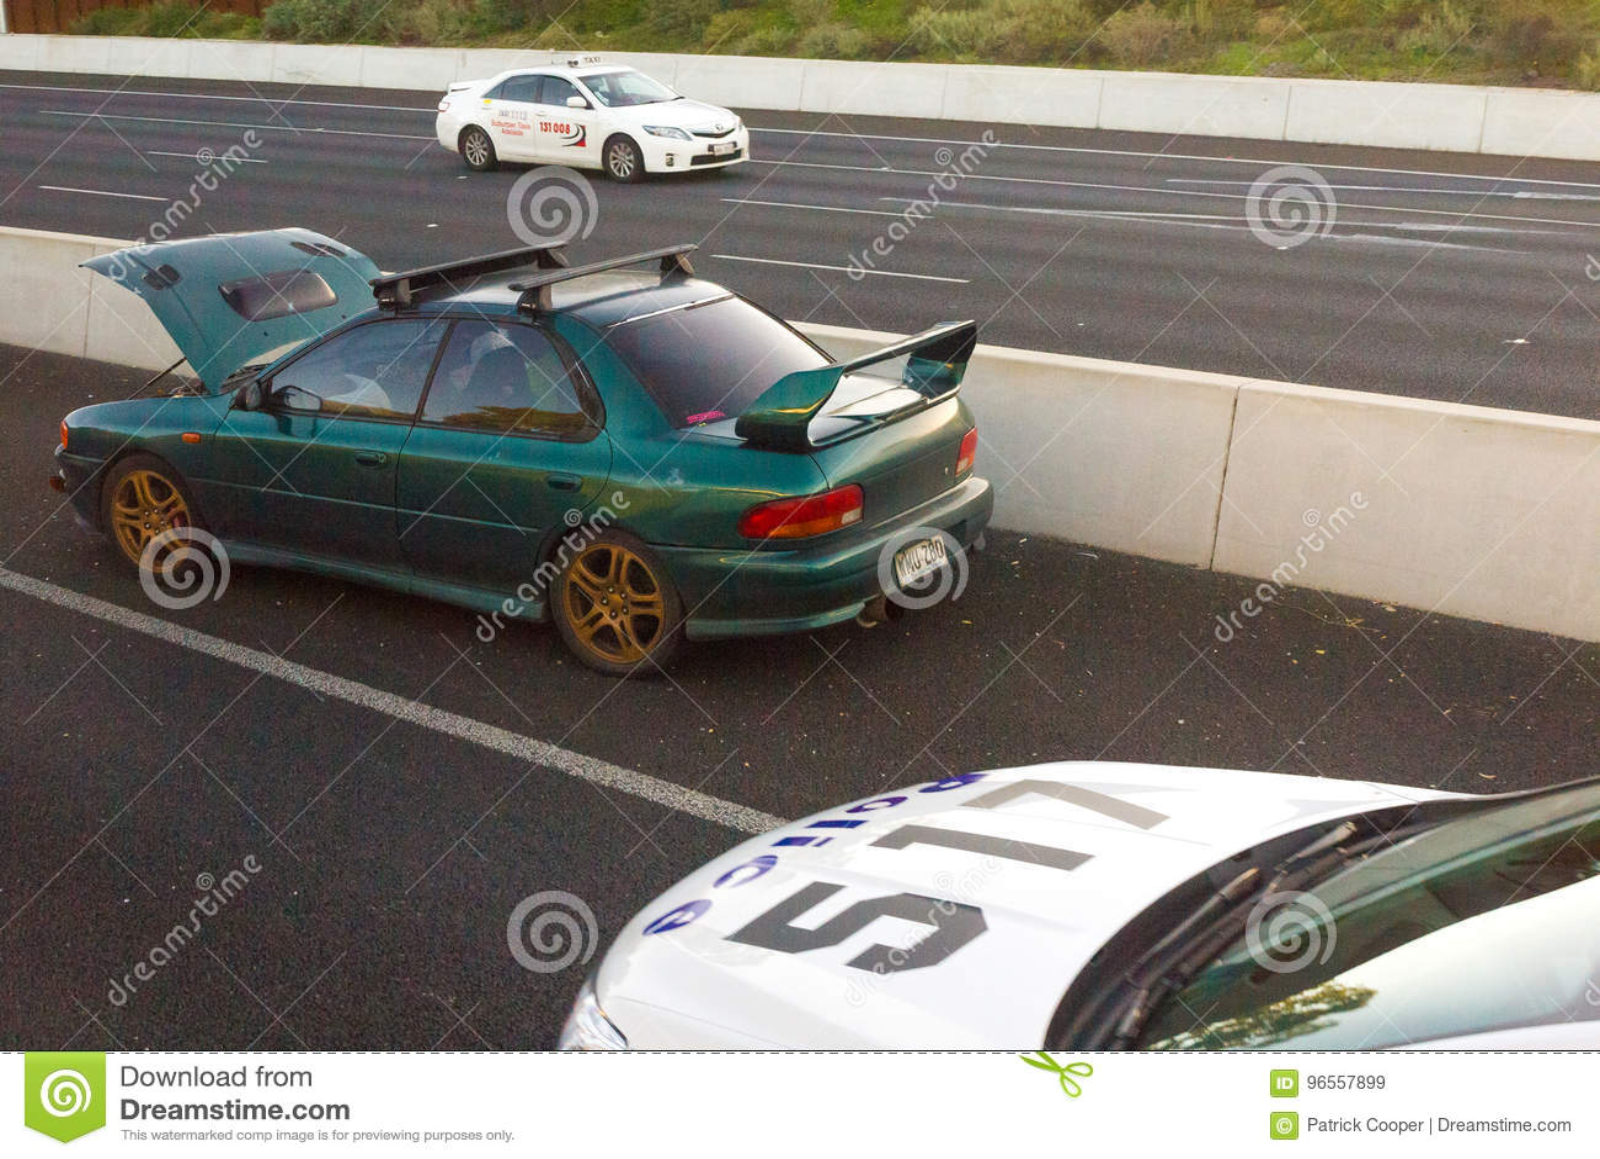 Car Crash On Southern Expressway South Australia Editorial Stock